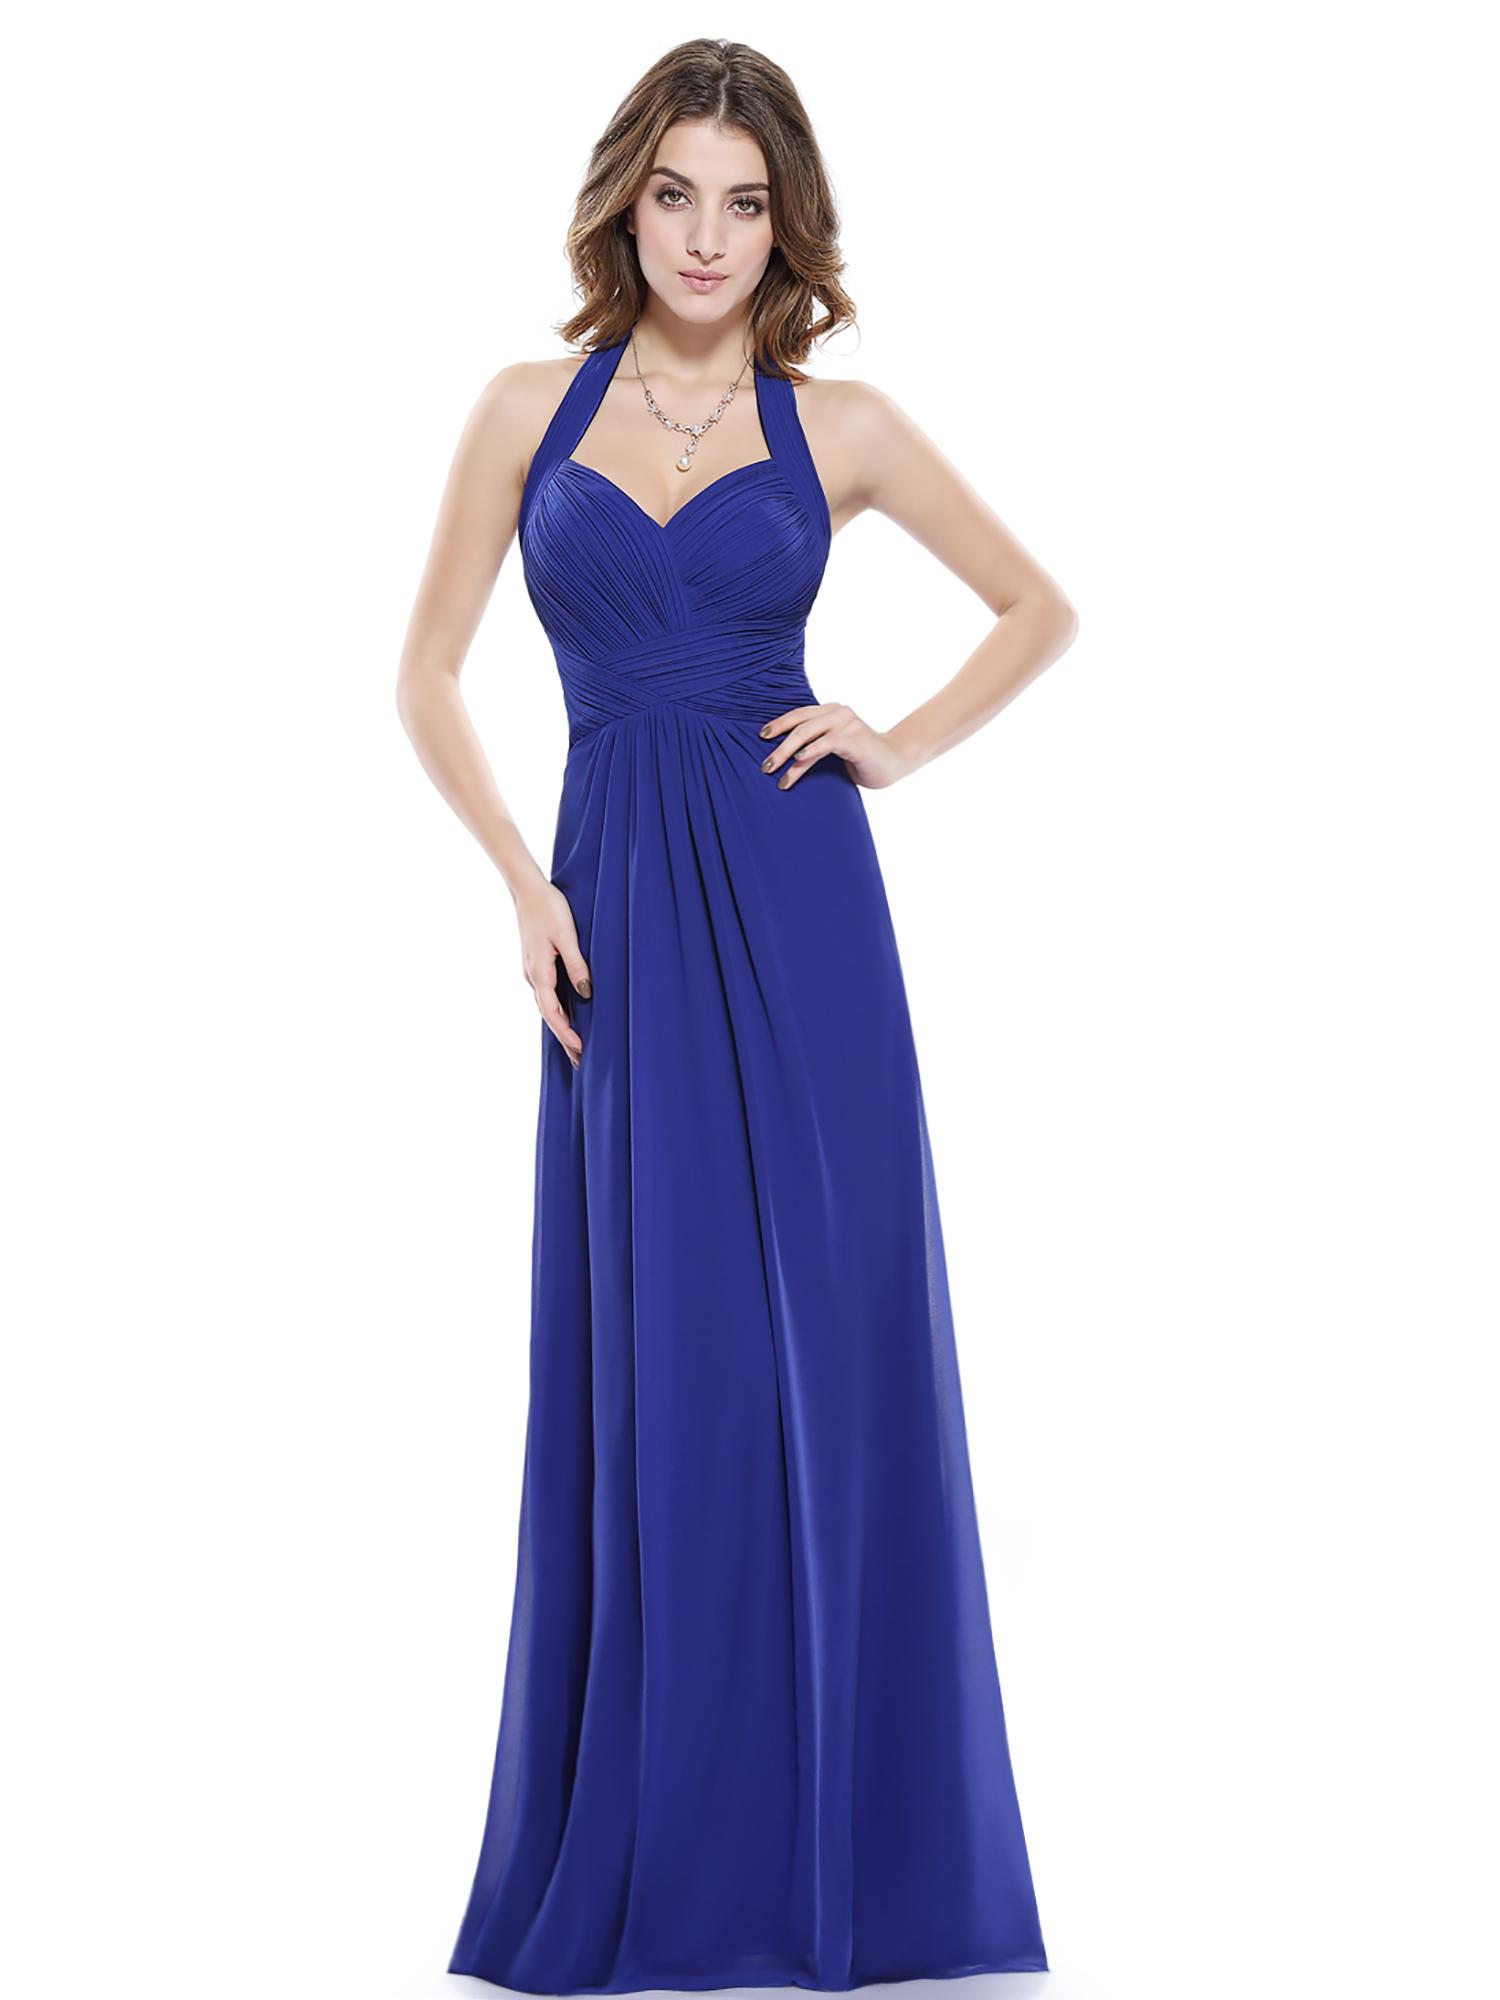 Women 39 s maxi halter bridesmaid dress evening wedding prom for Long maxi dresses for weddings